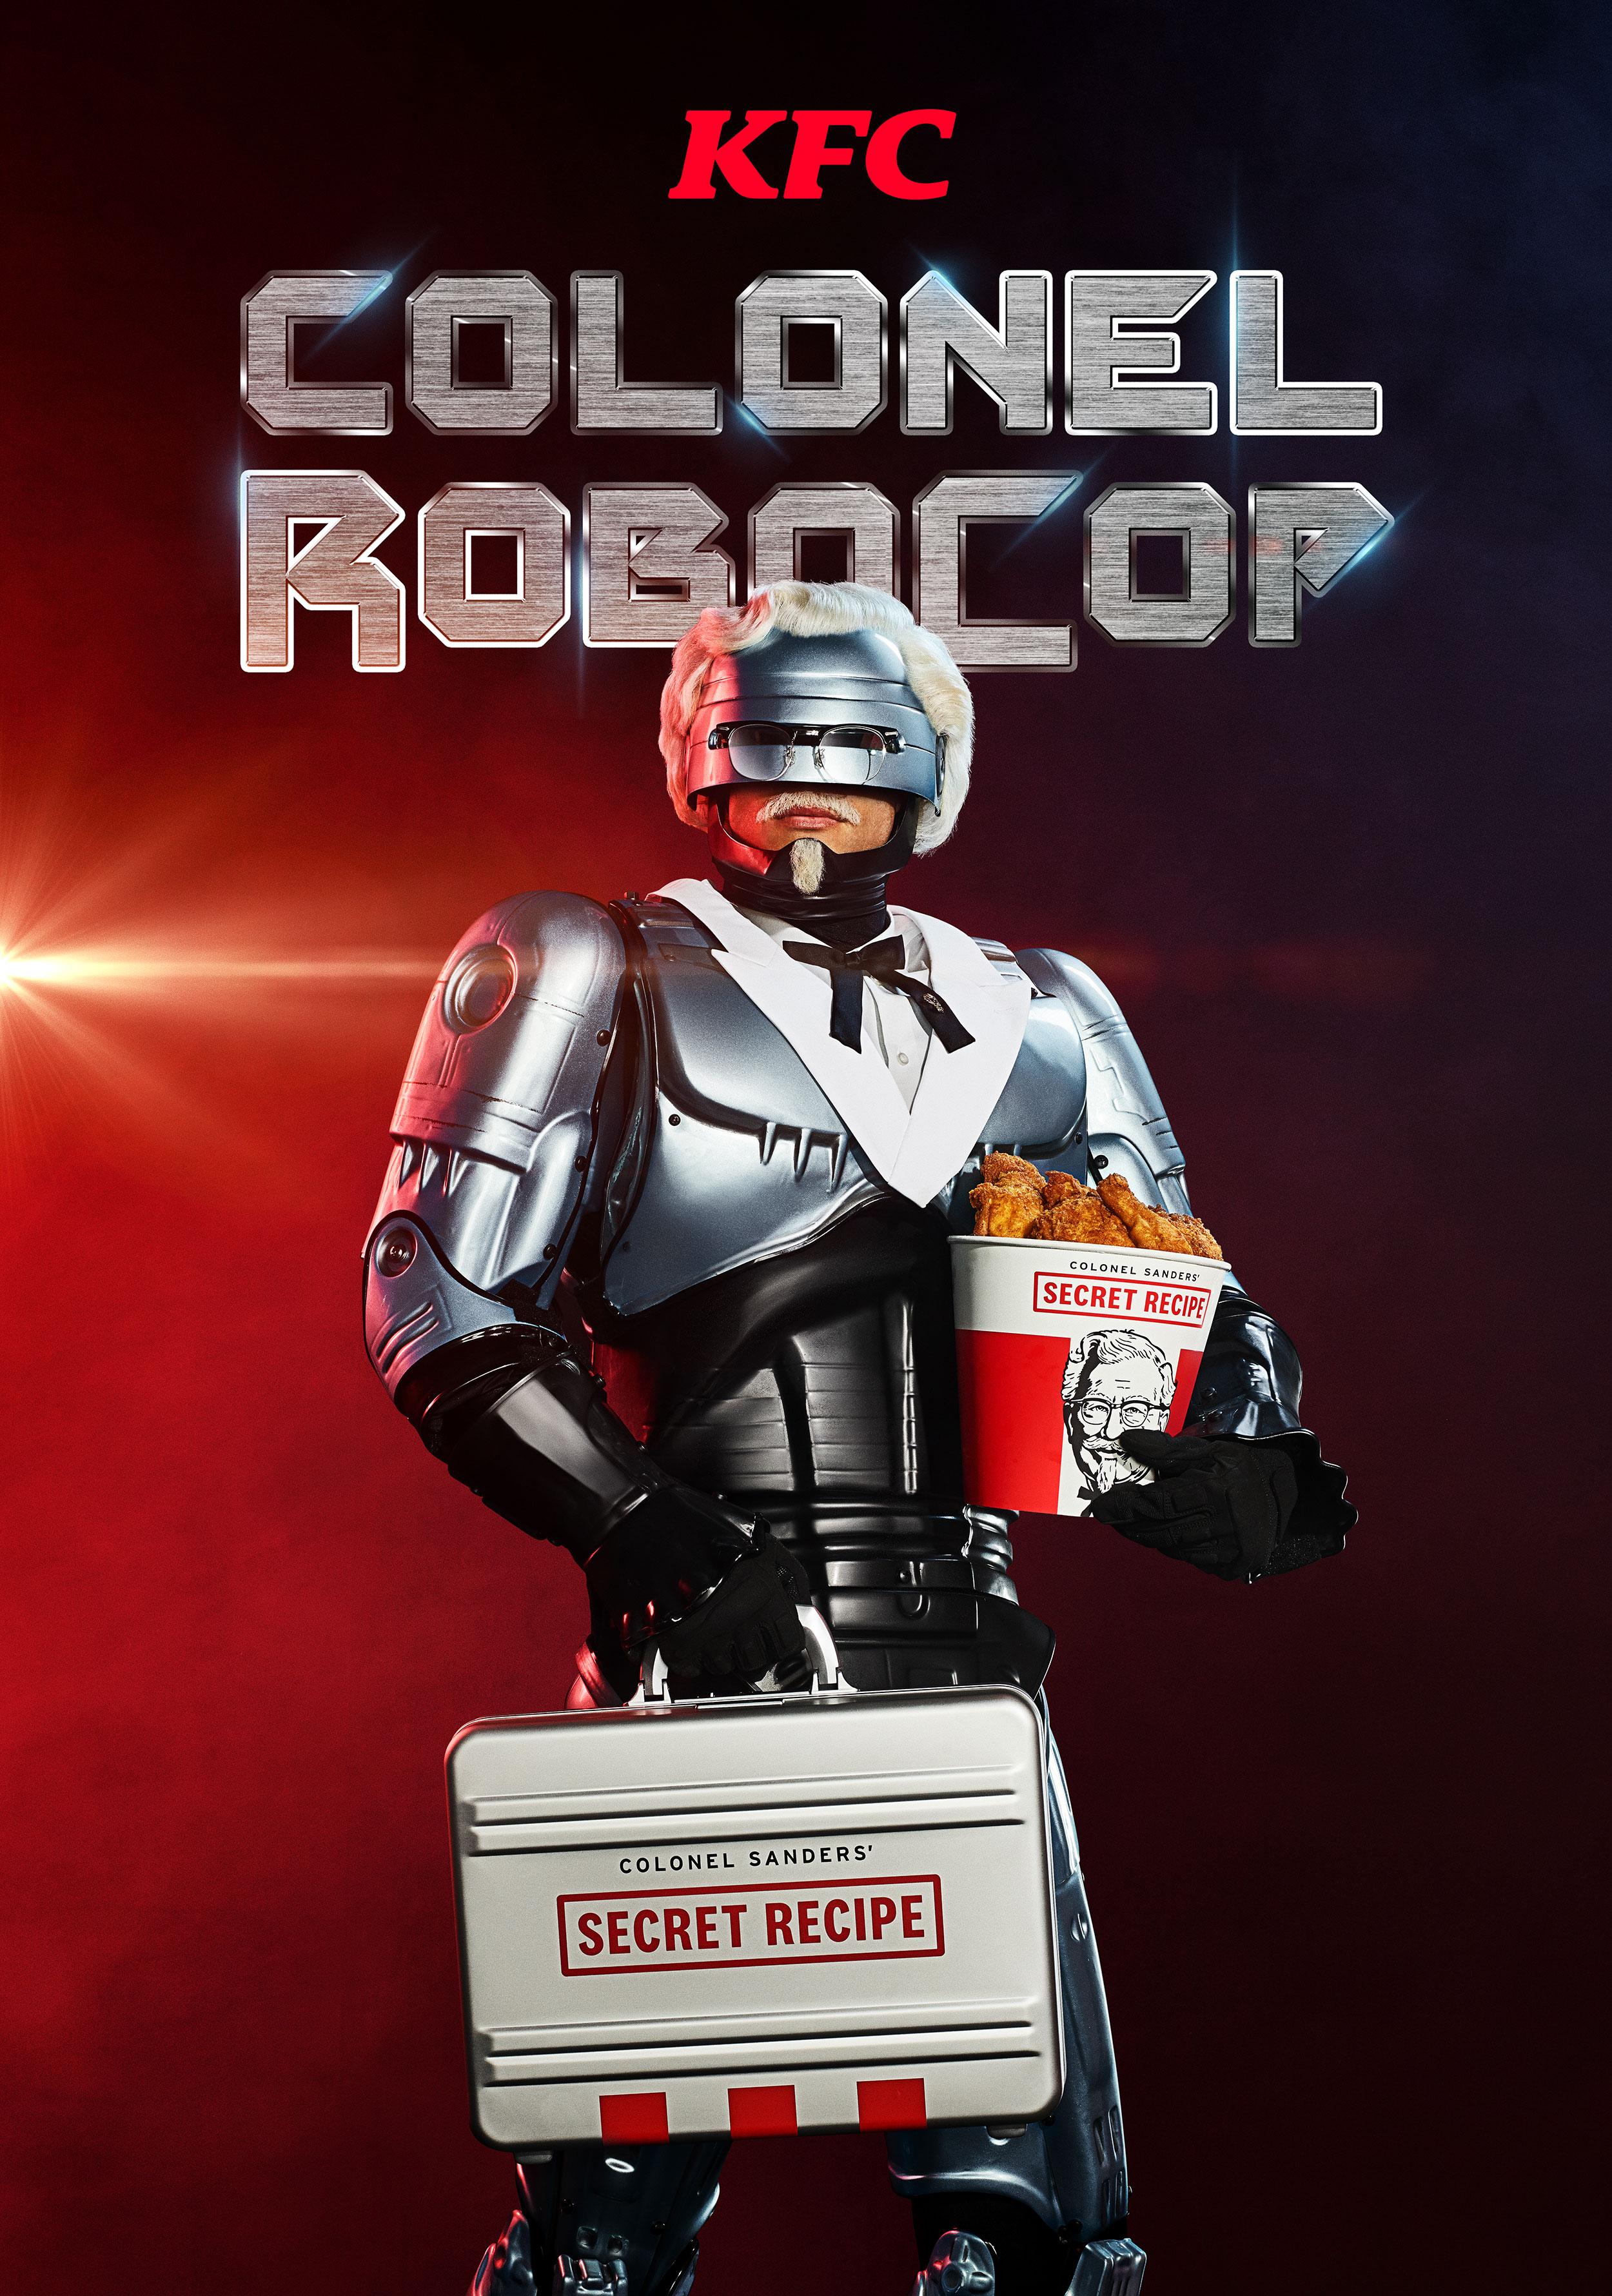 KFC_Robocolonel_by_Emily_Shur_2.jpg